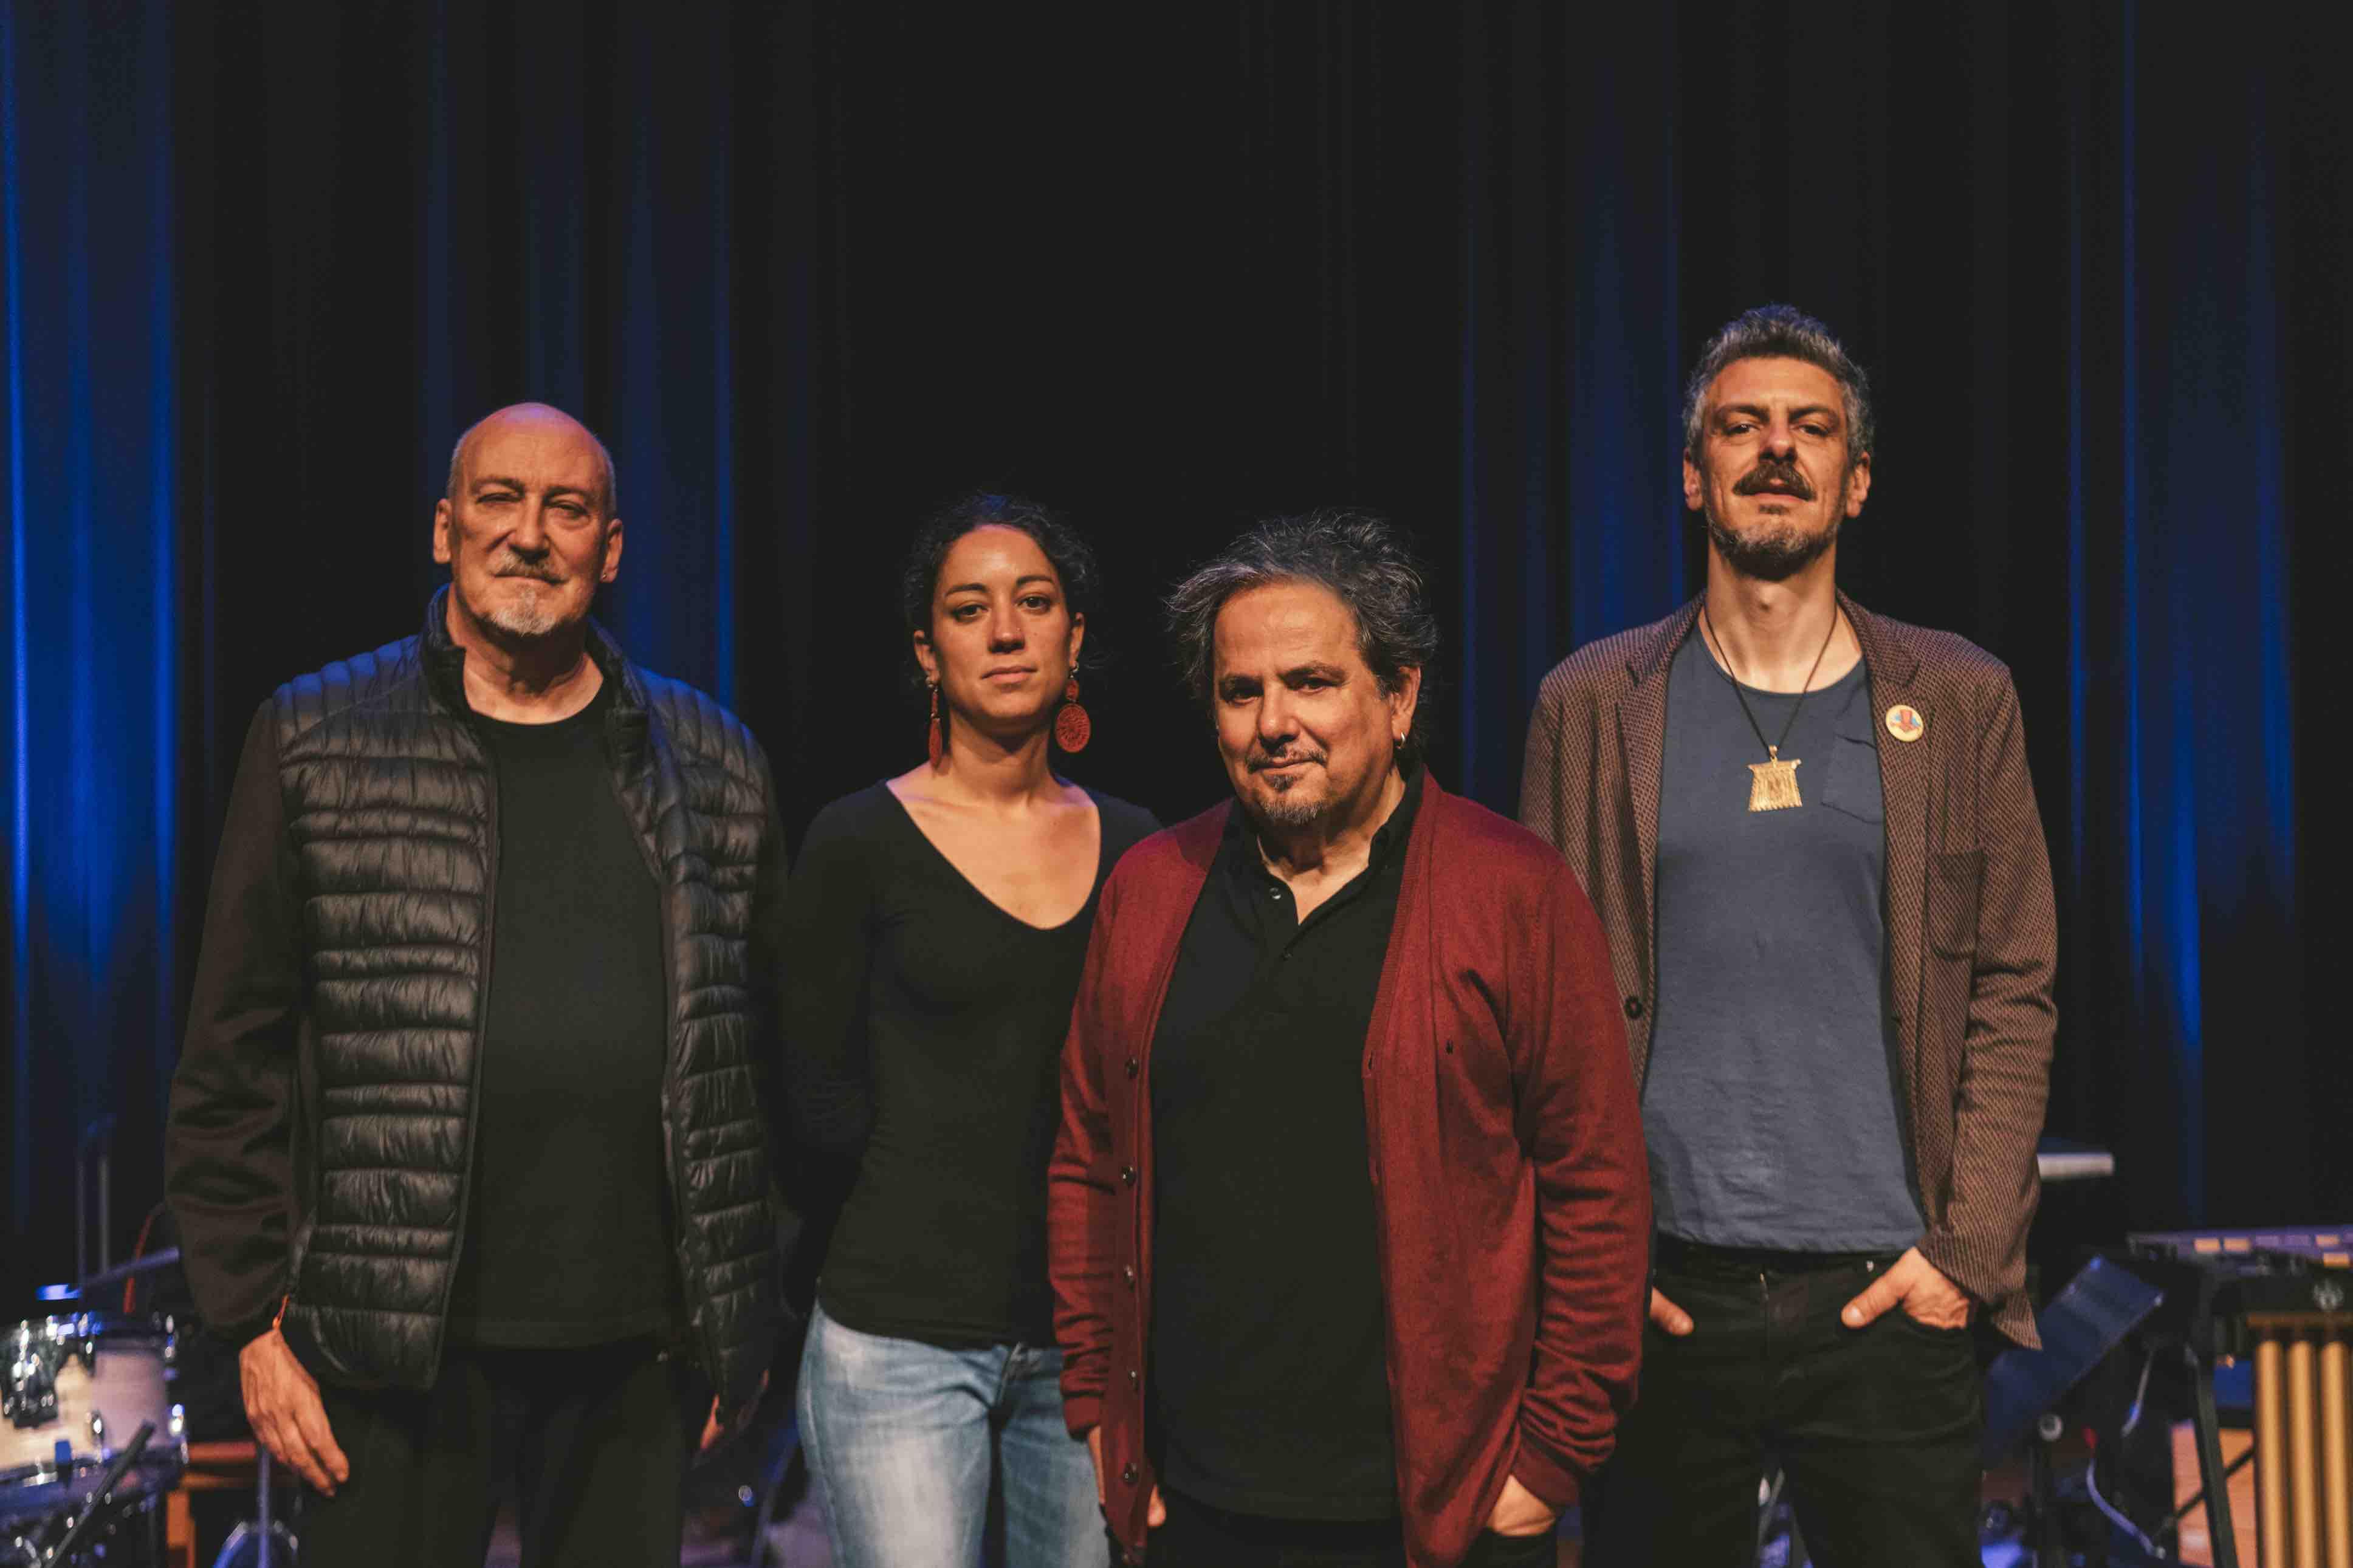 EnzoFavataCrossingQuartet In Gallura la quarta edizione del festival San Teodoro Jazz